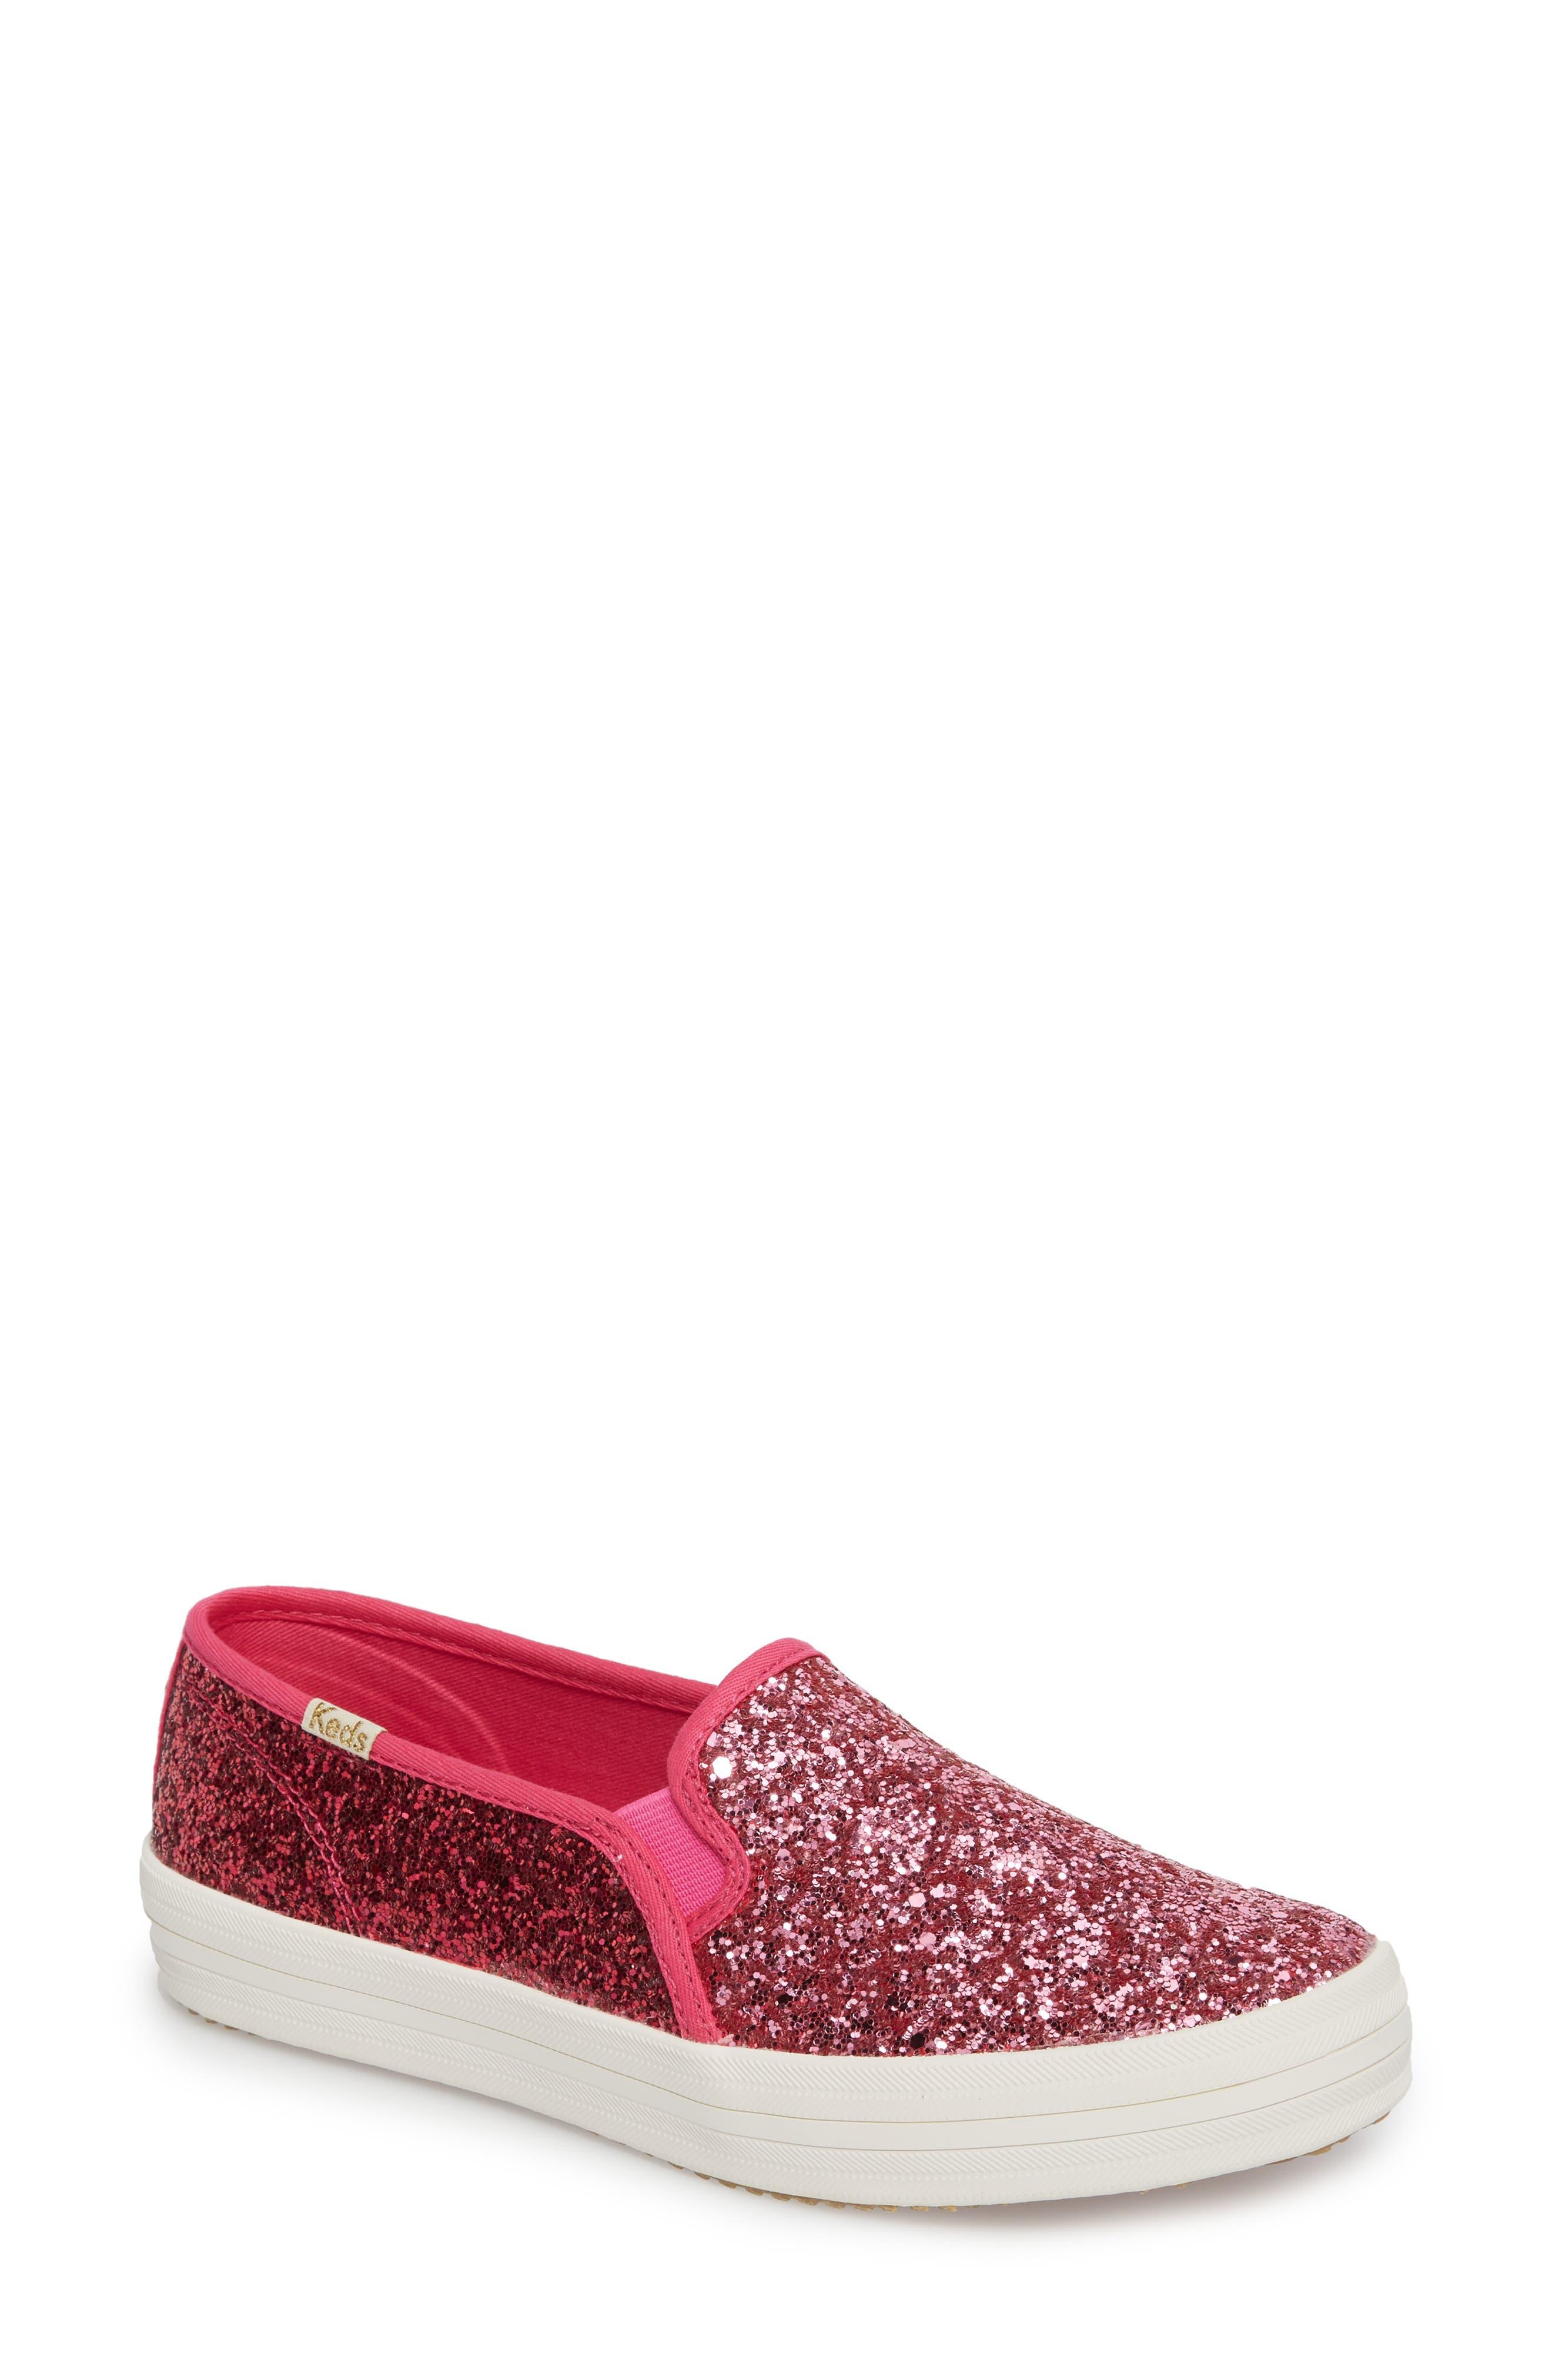 double decker glitter slip-on sneaker,                         Main,                         color, Pink Glitter